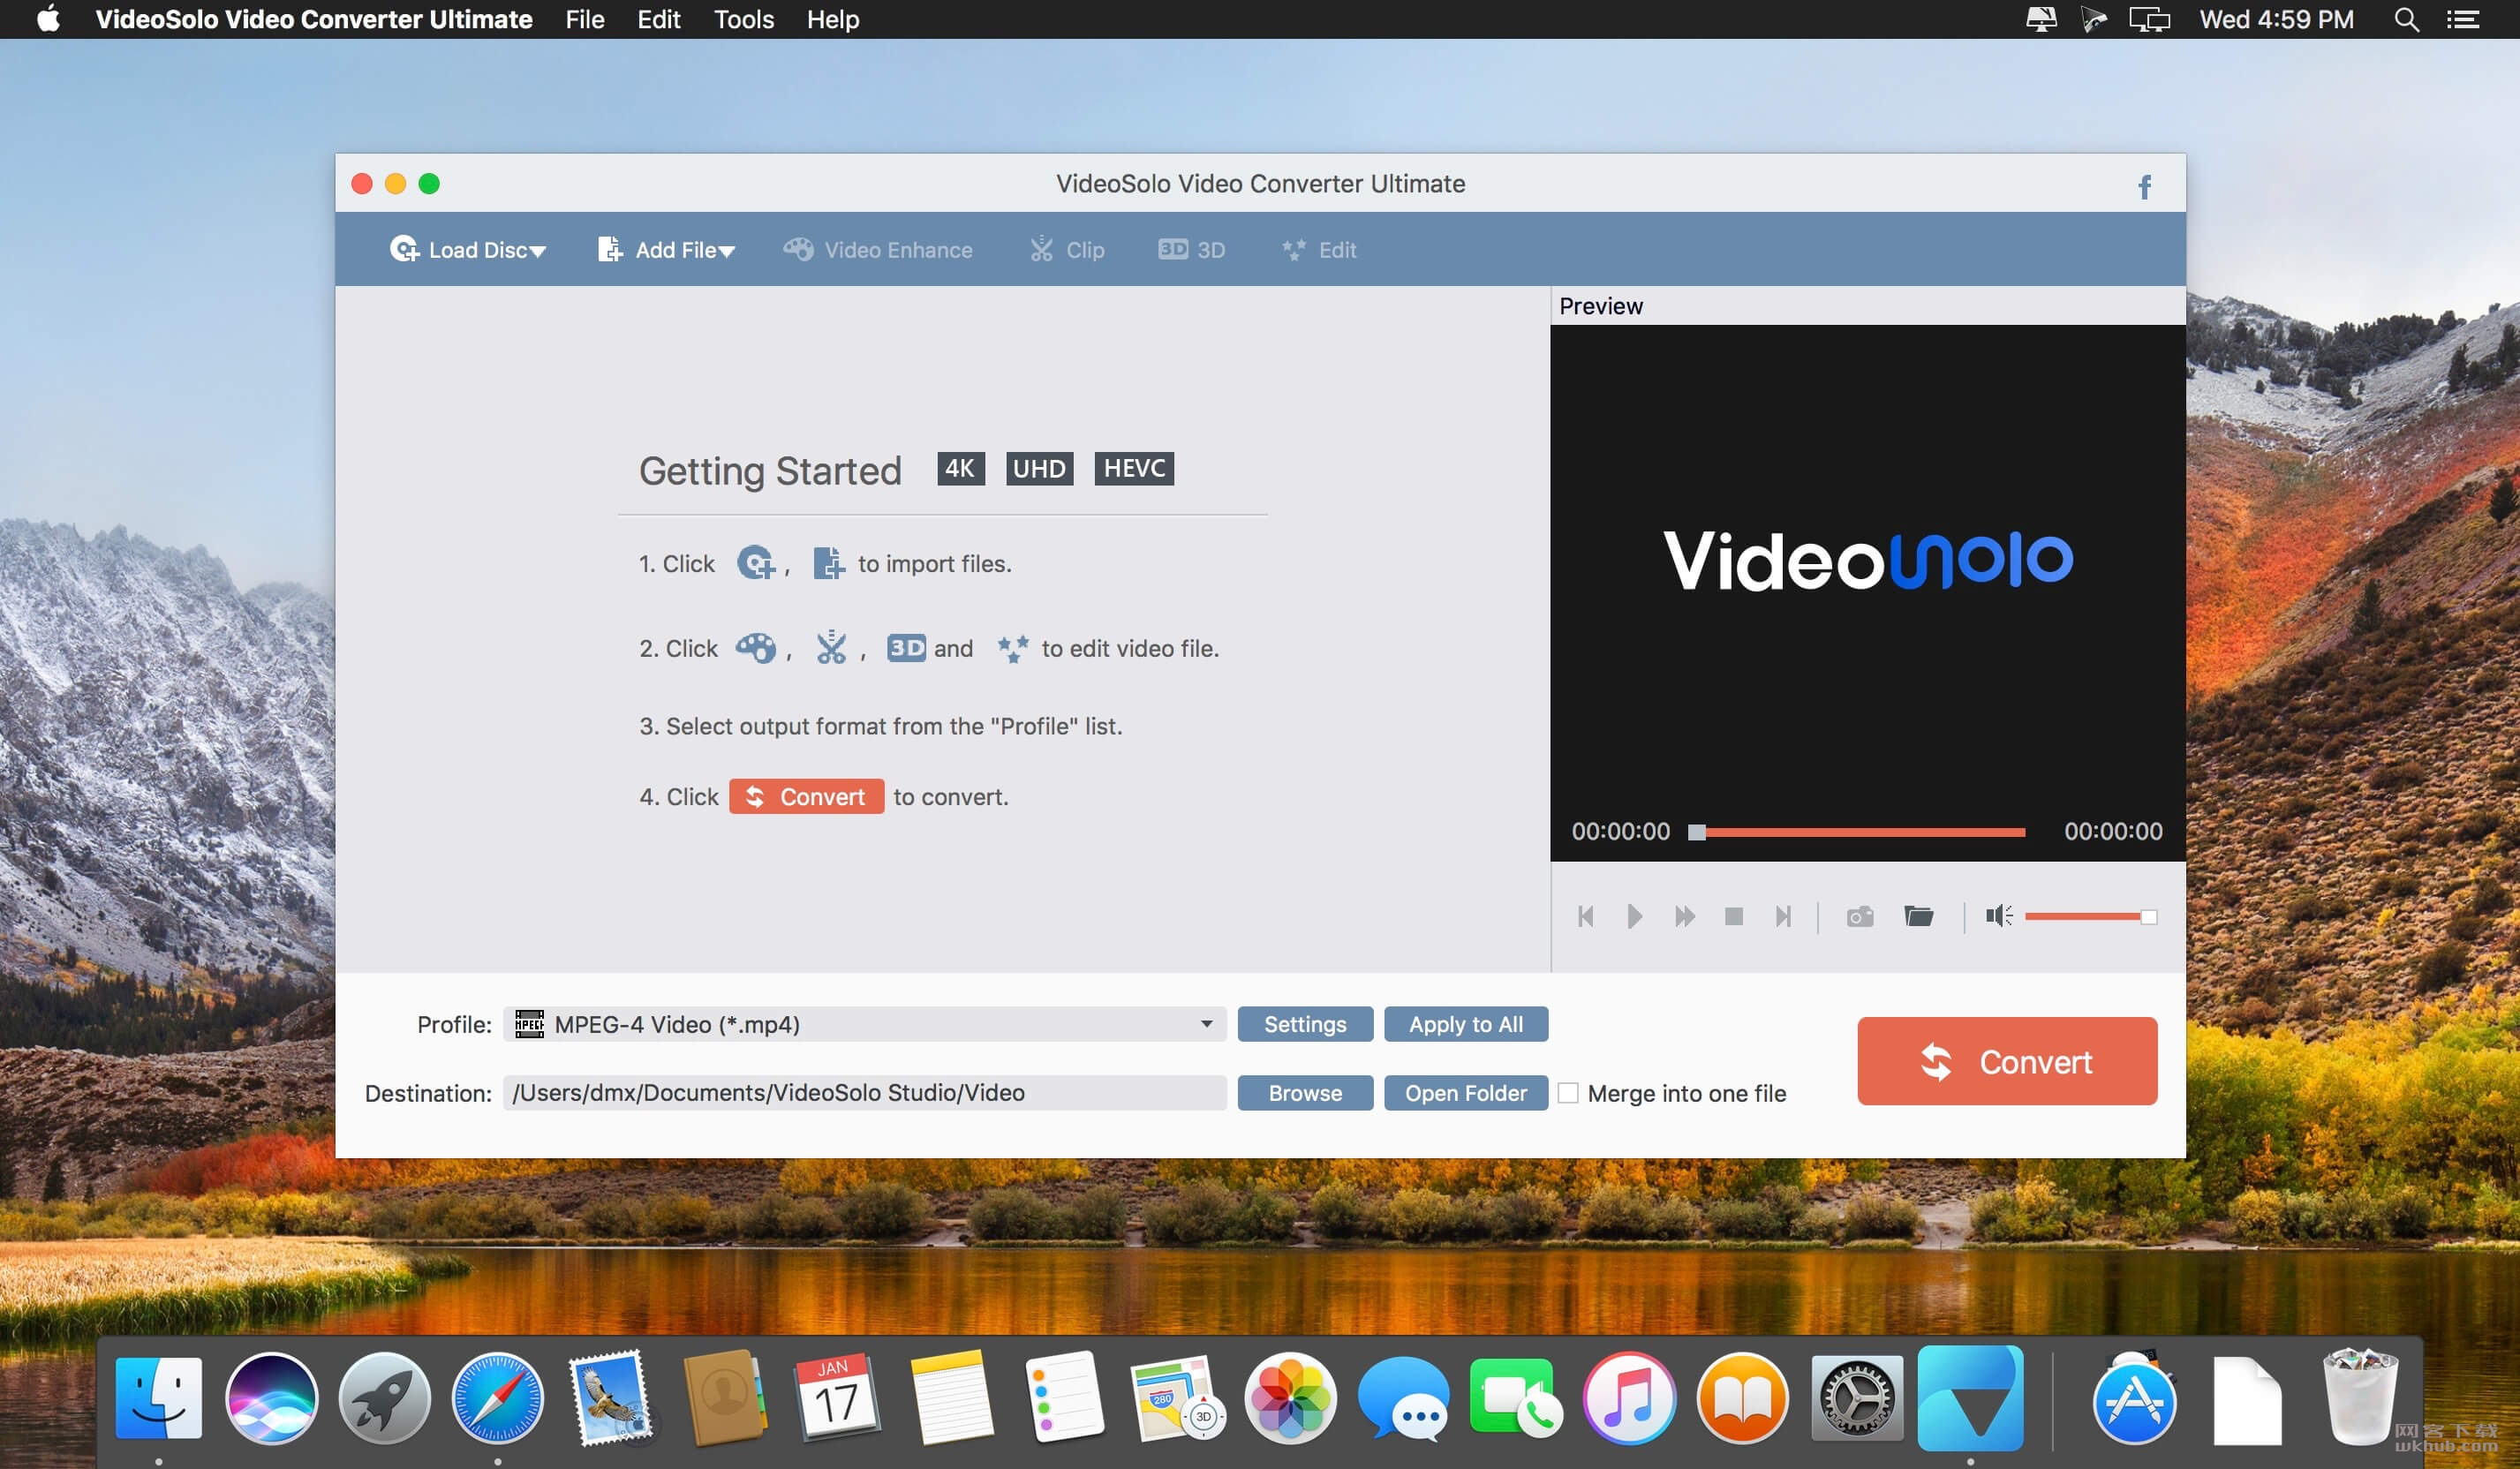 VideoSolo Video Converter Ultimate 1.0.30 视频转换工具